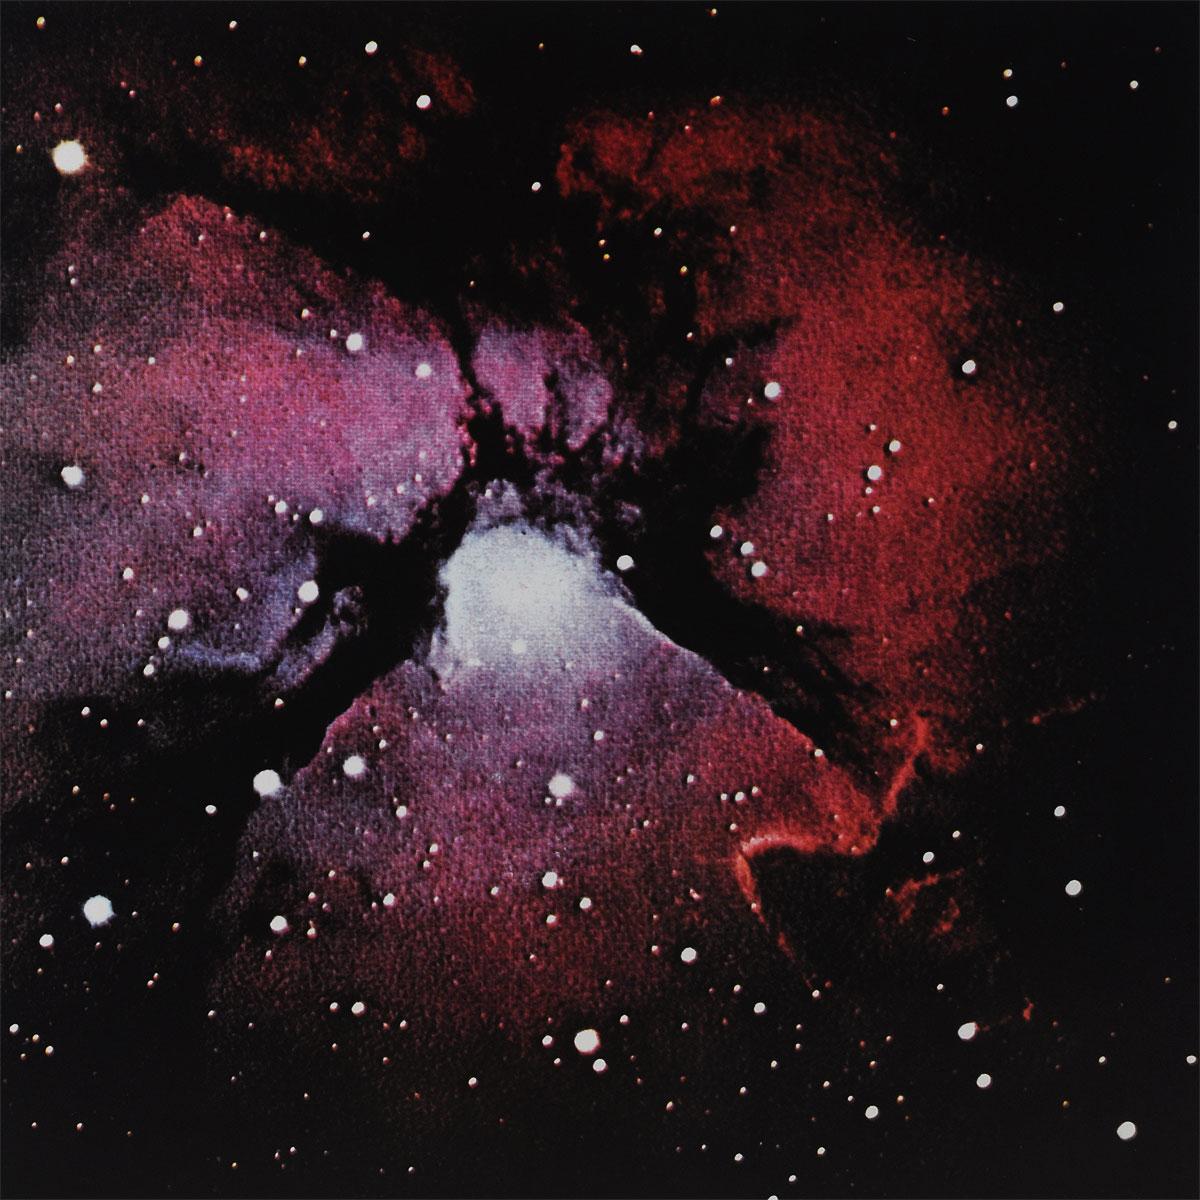 King Crimson,Роберт Фрипп King Crimson. Islands (LP) king crimson king crimson starless 40th anniversary series 23 cd 2 dvd 2 blu ray